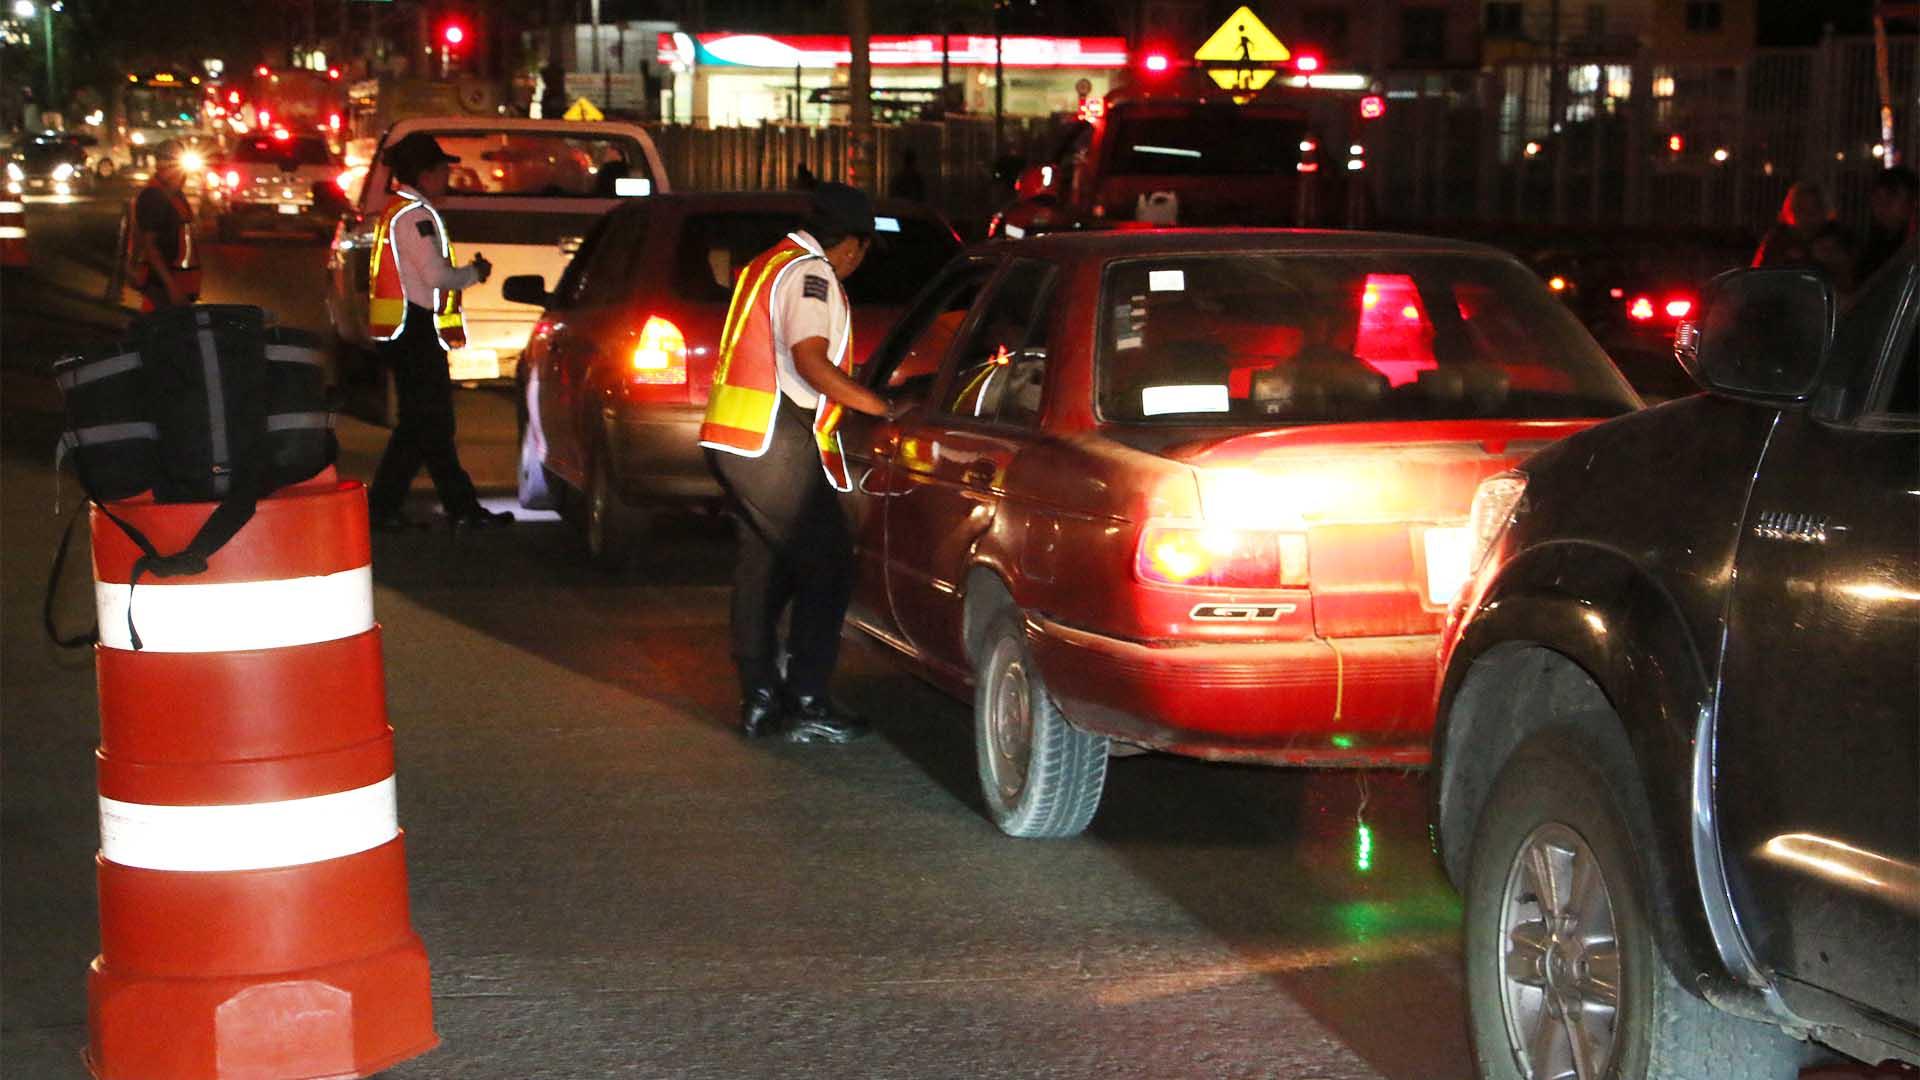 Apresan a 14 al conducir ebrios en Oaxaca | El Imparcial de Oaxaca